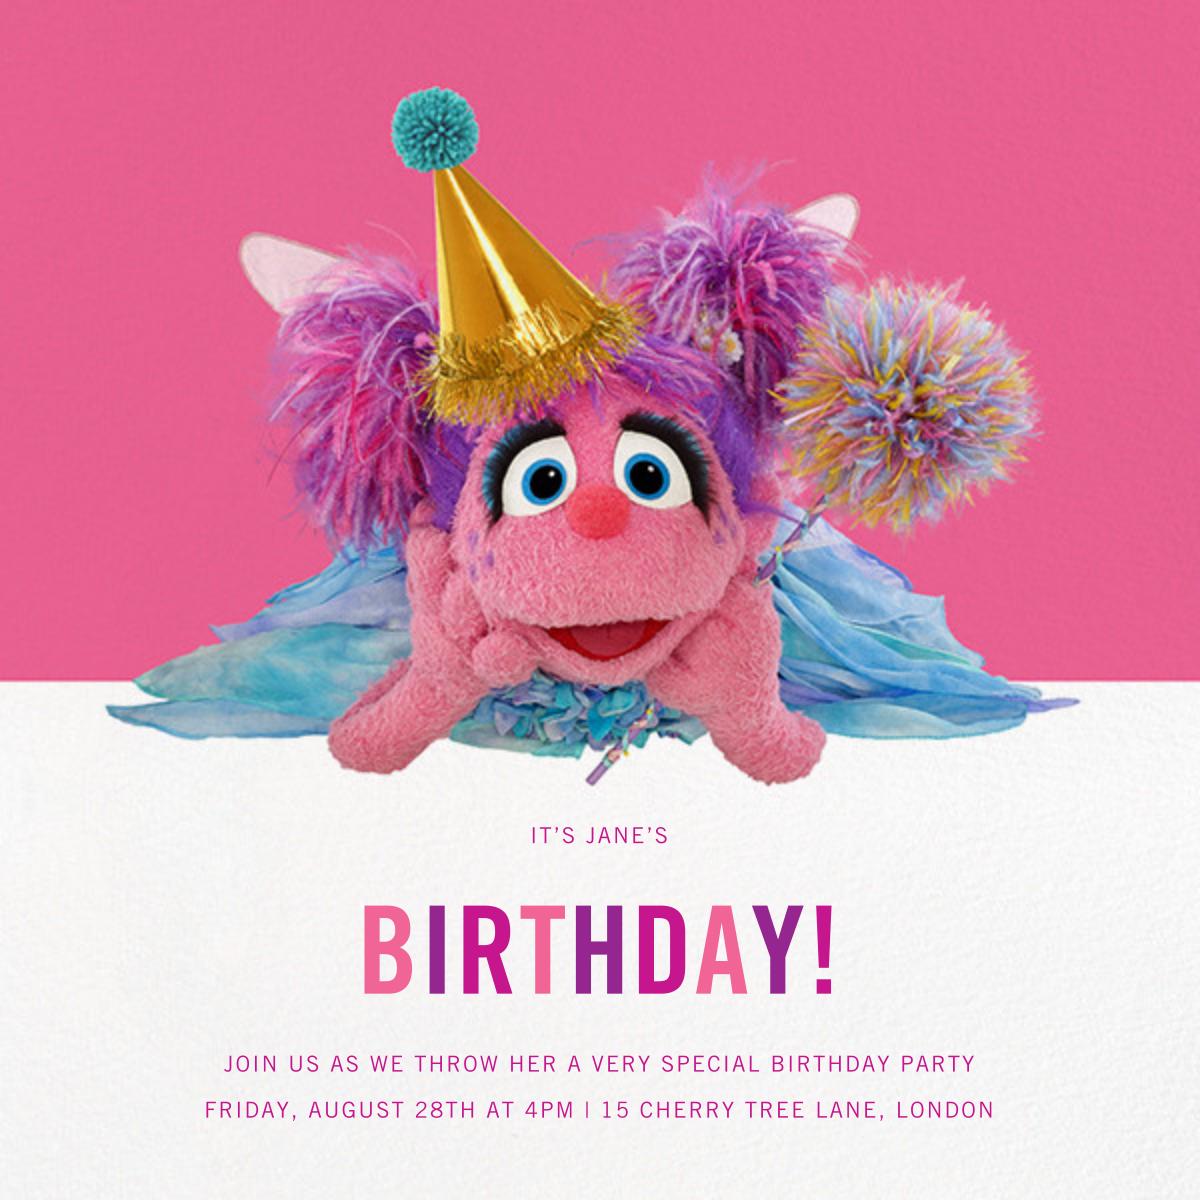 Abby Cadabby - Sesame Street - First birthday and baby